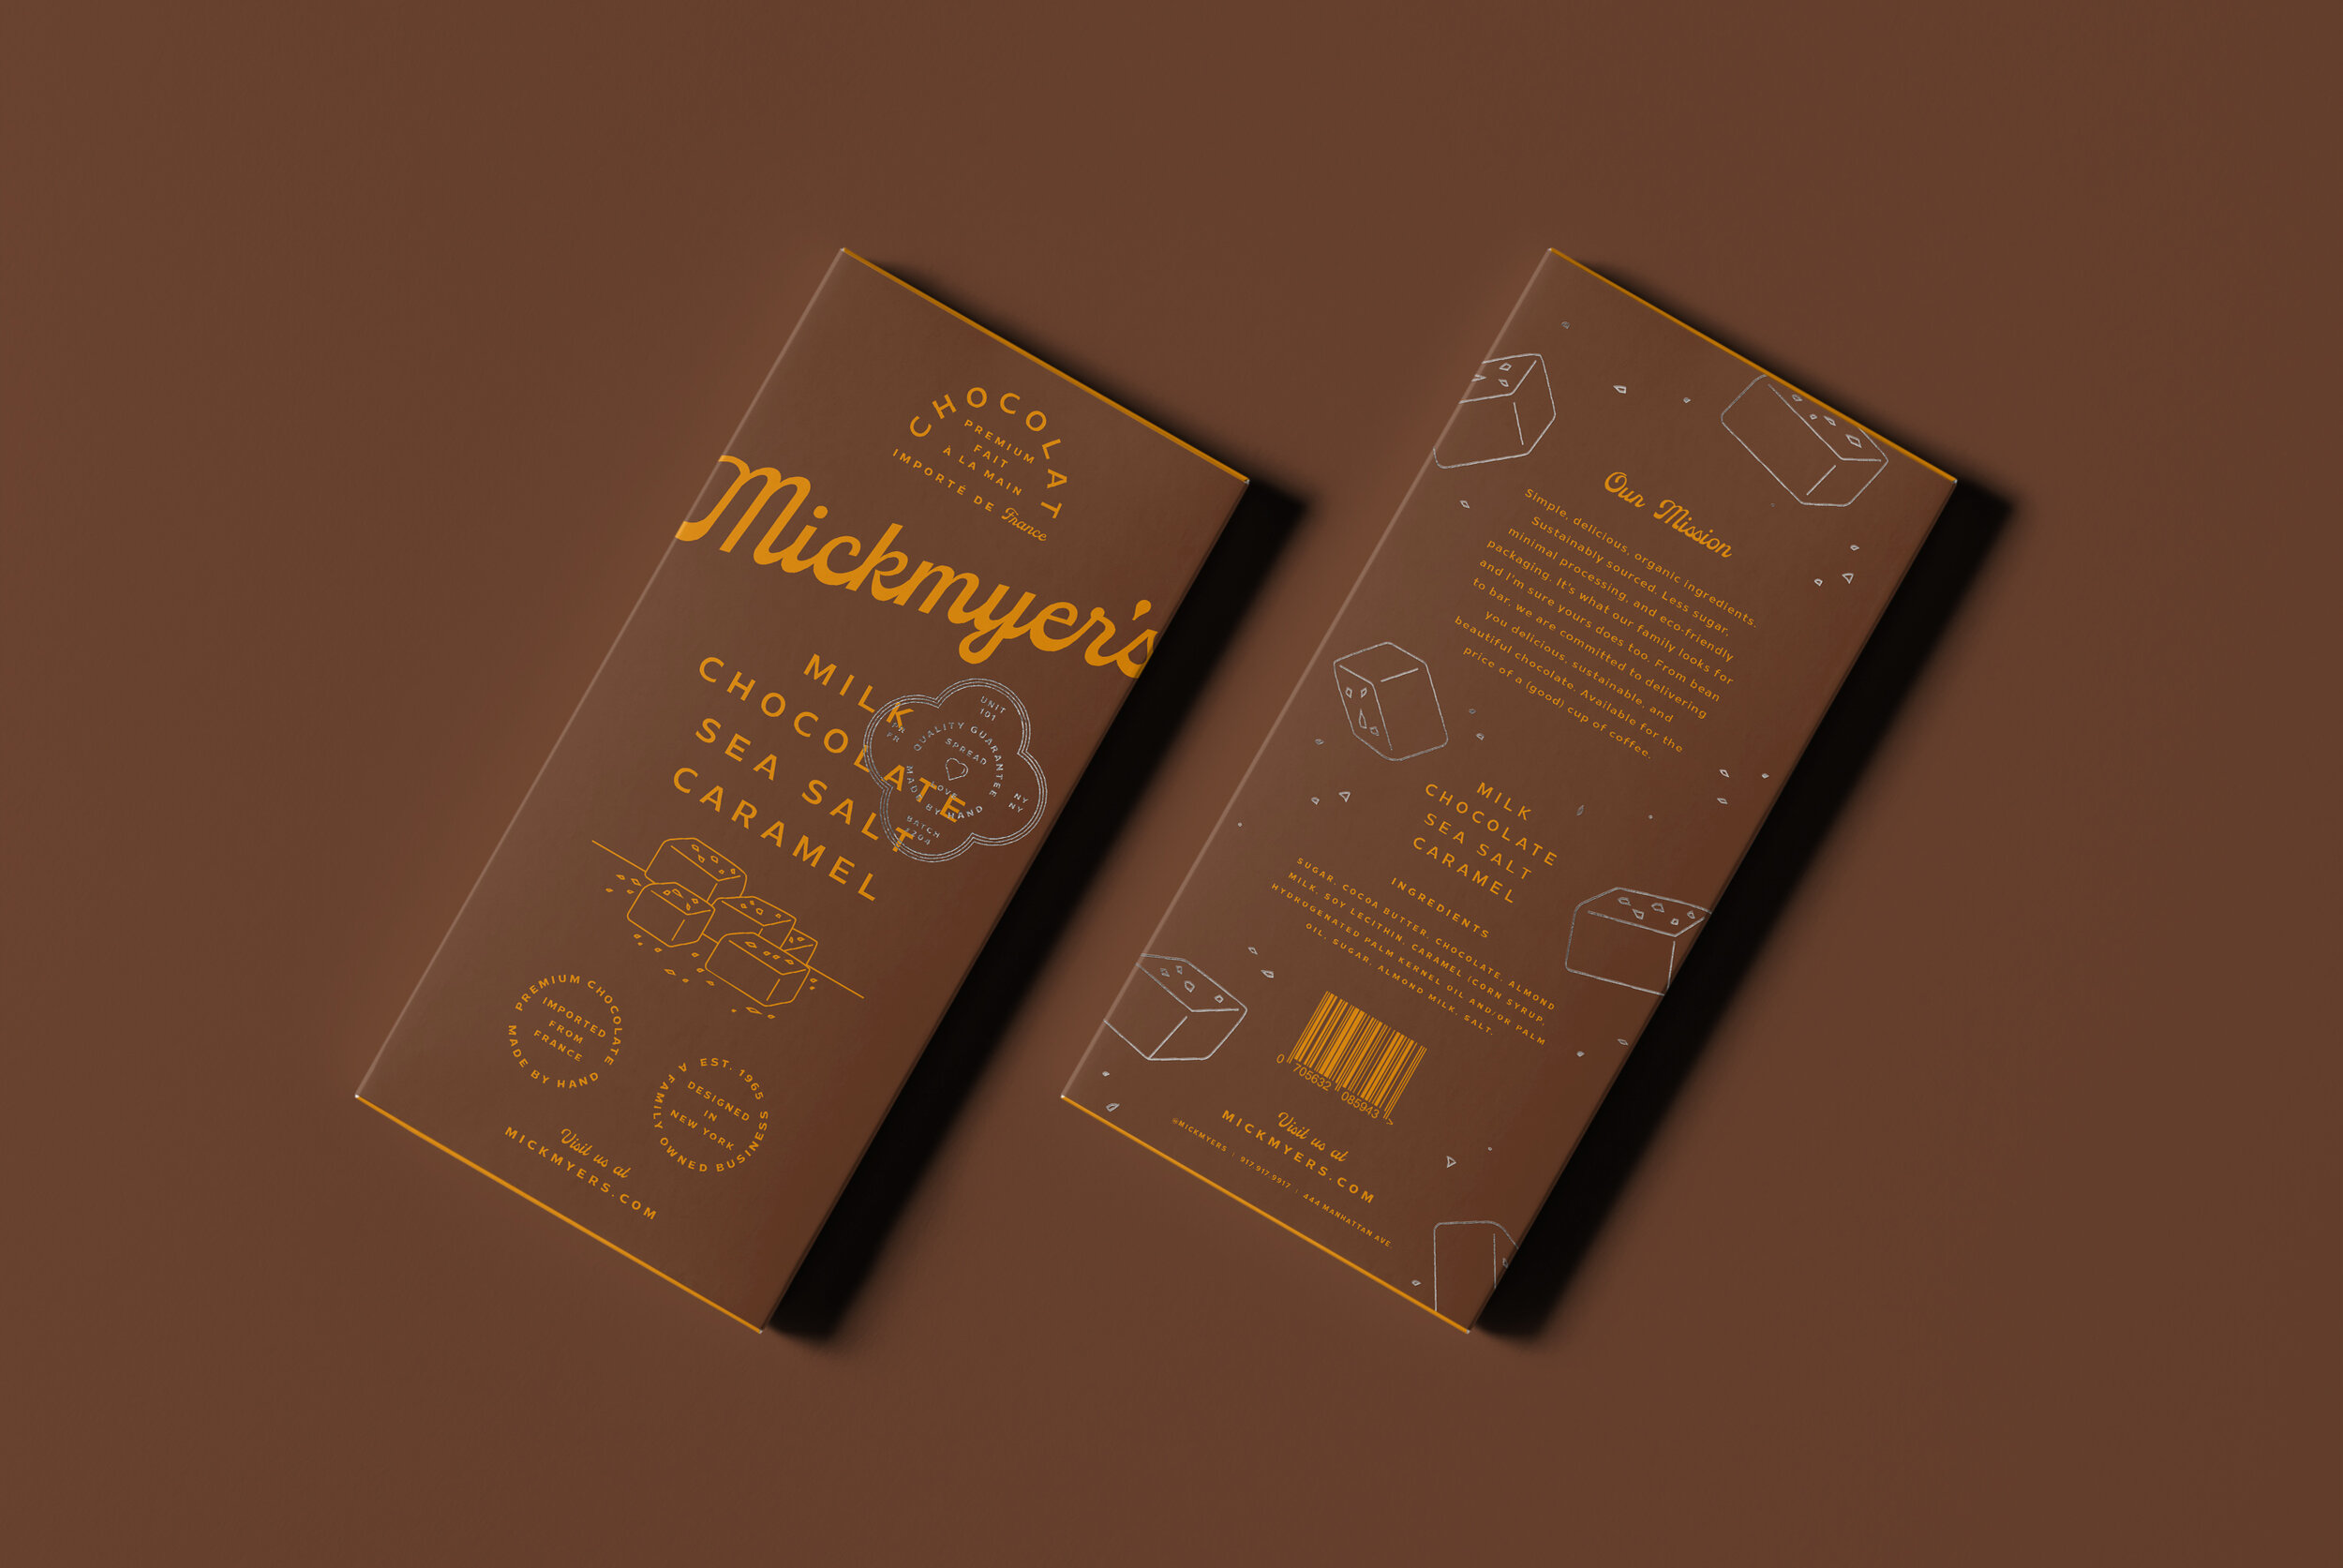 Mickmyers-Packaging-Front-BackSC.jpg